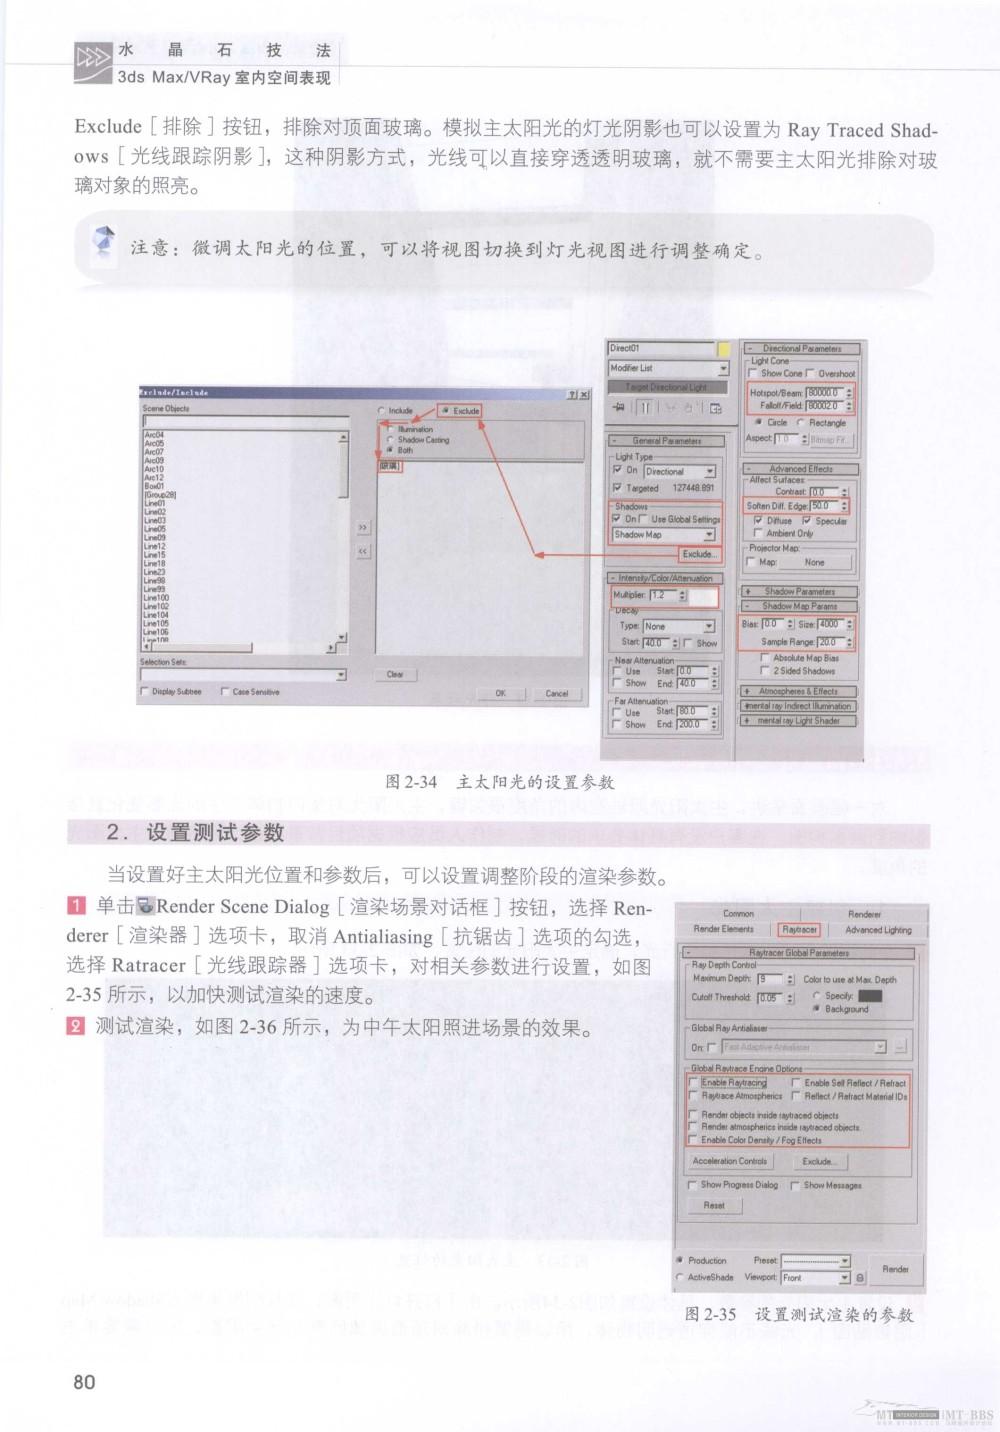 水晶石技法-3ds_Max&VRay室内空间表现_水晶石技法-3ds_Max&VRay室内空间表现_页面_086.jpg